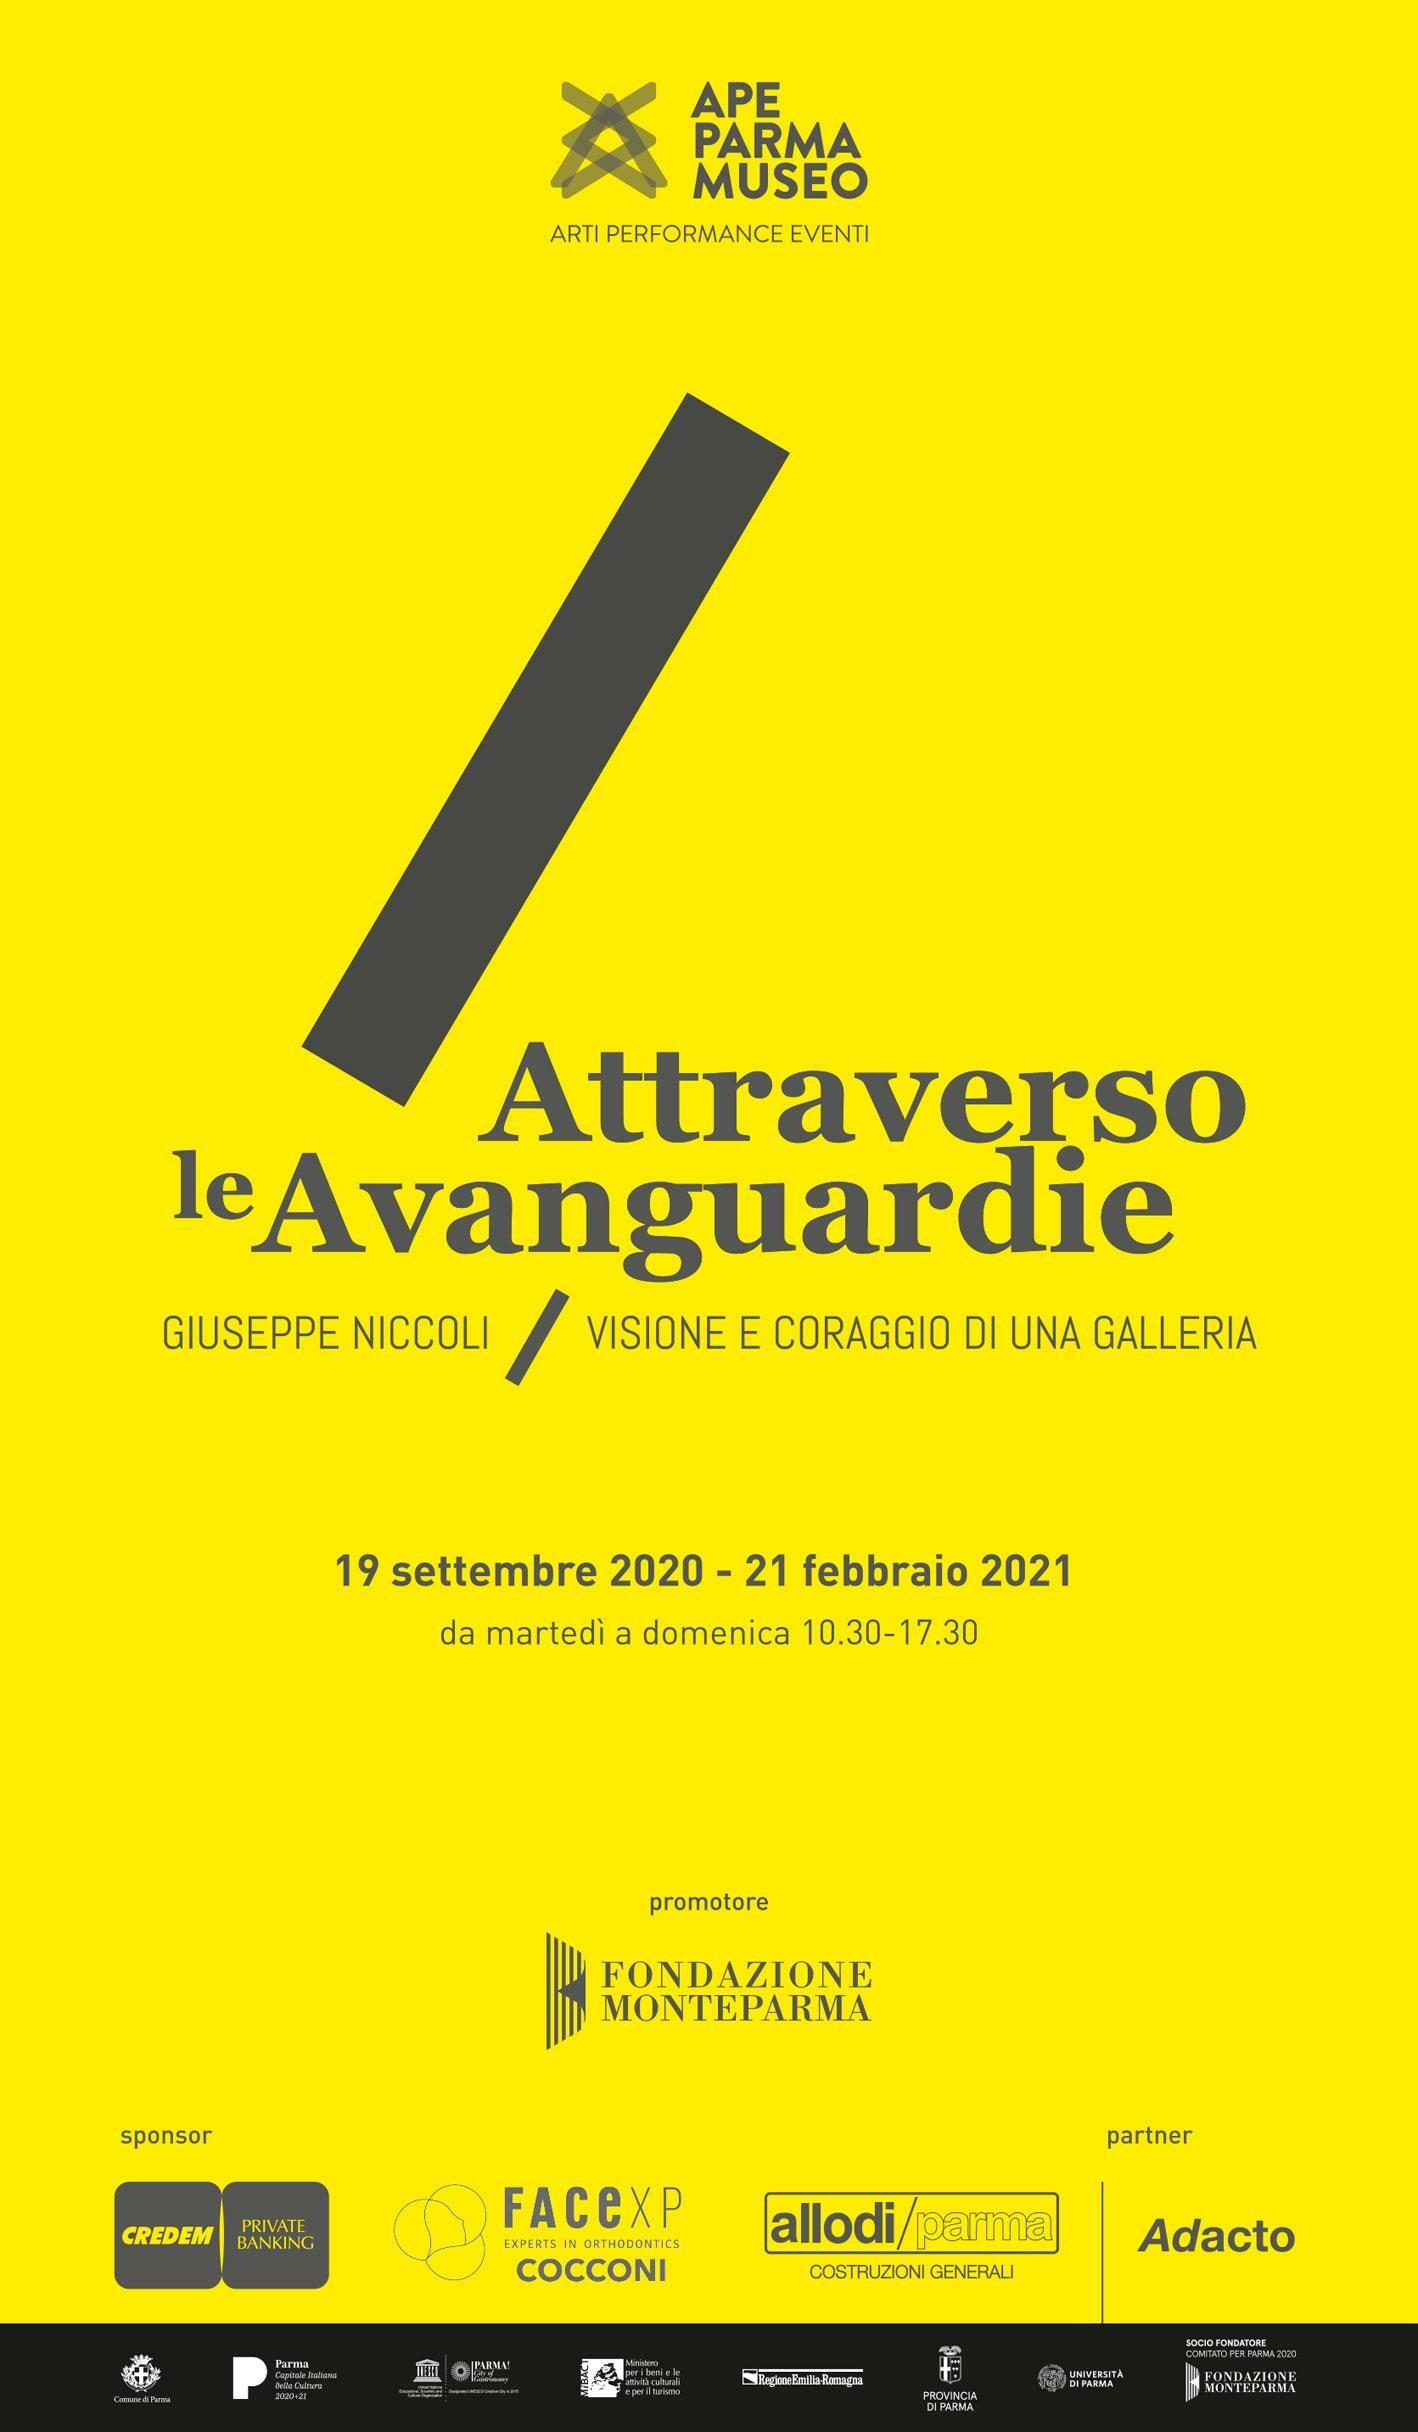 Attraverso le Avanguardie all'APE Parma Museo